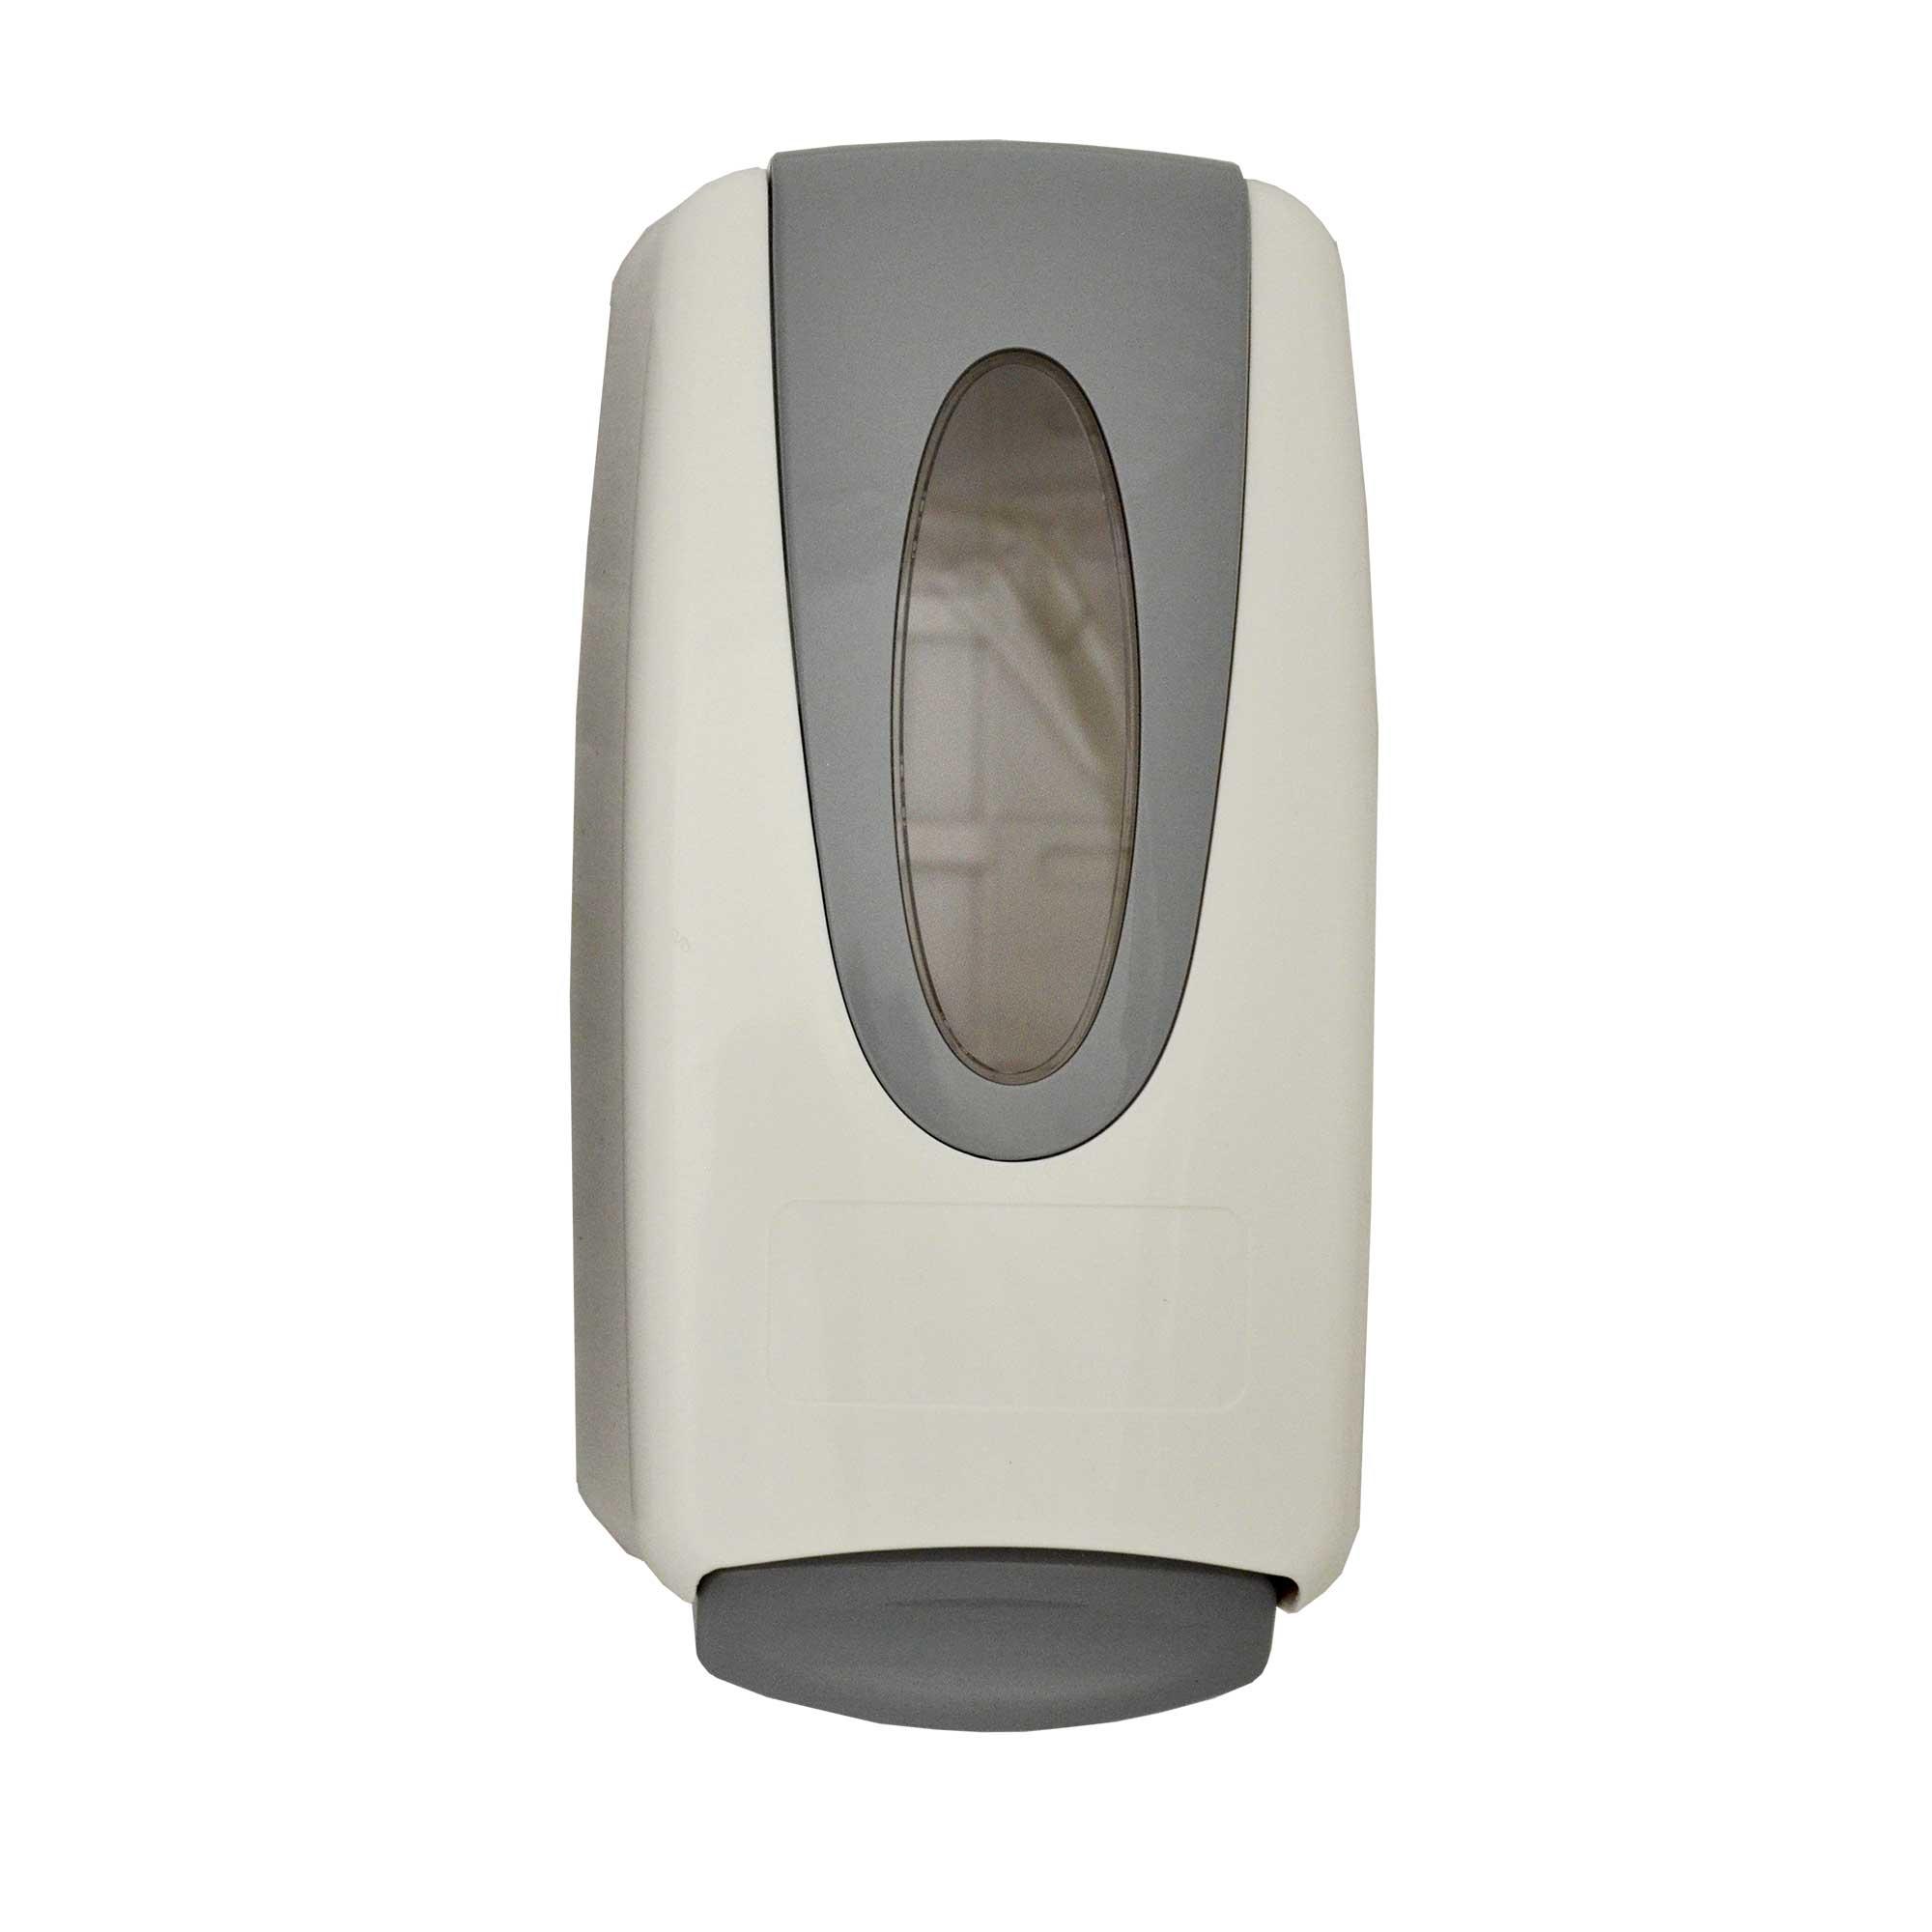 EZ-SAN® Soap Dispenser - White Manual